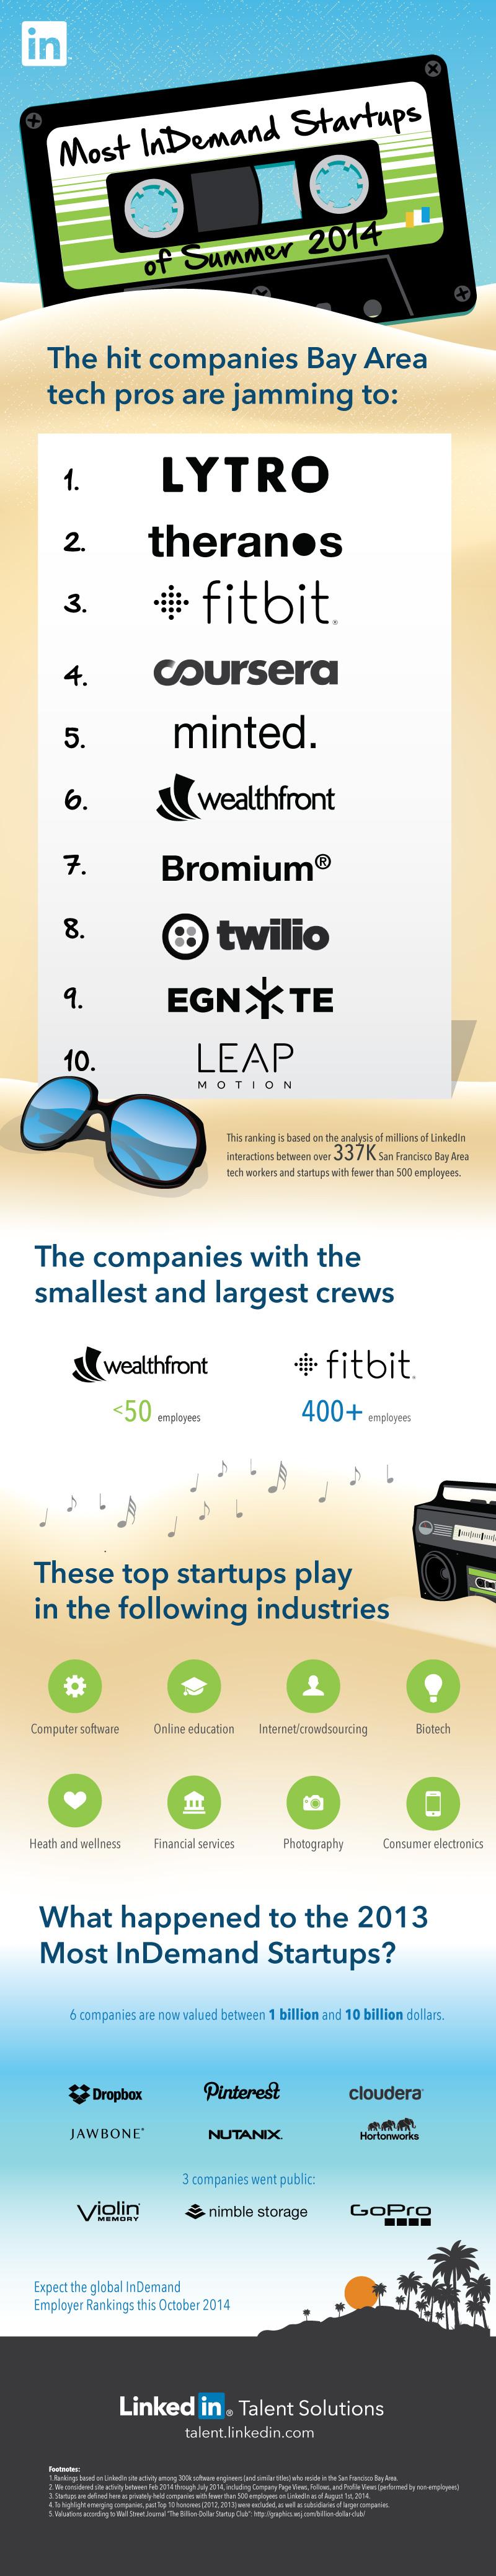 most indemand startups silicon valley